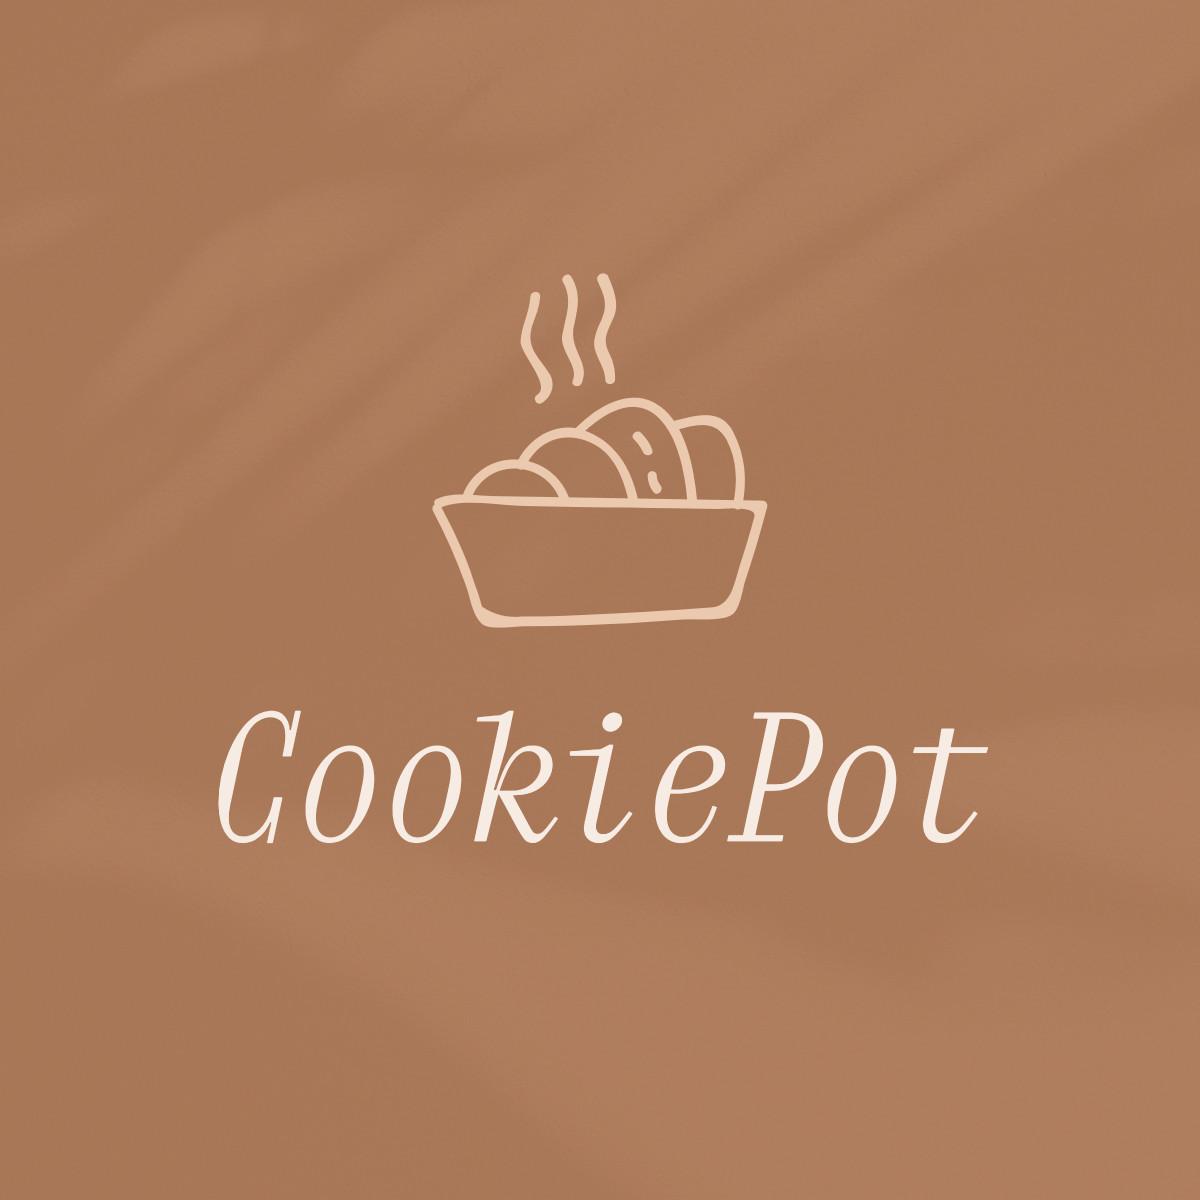 Logo template design for a baking company